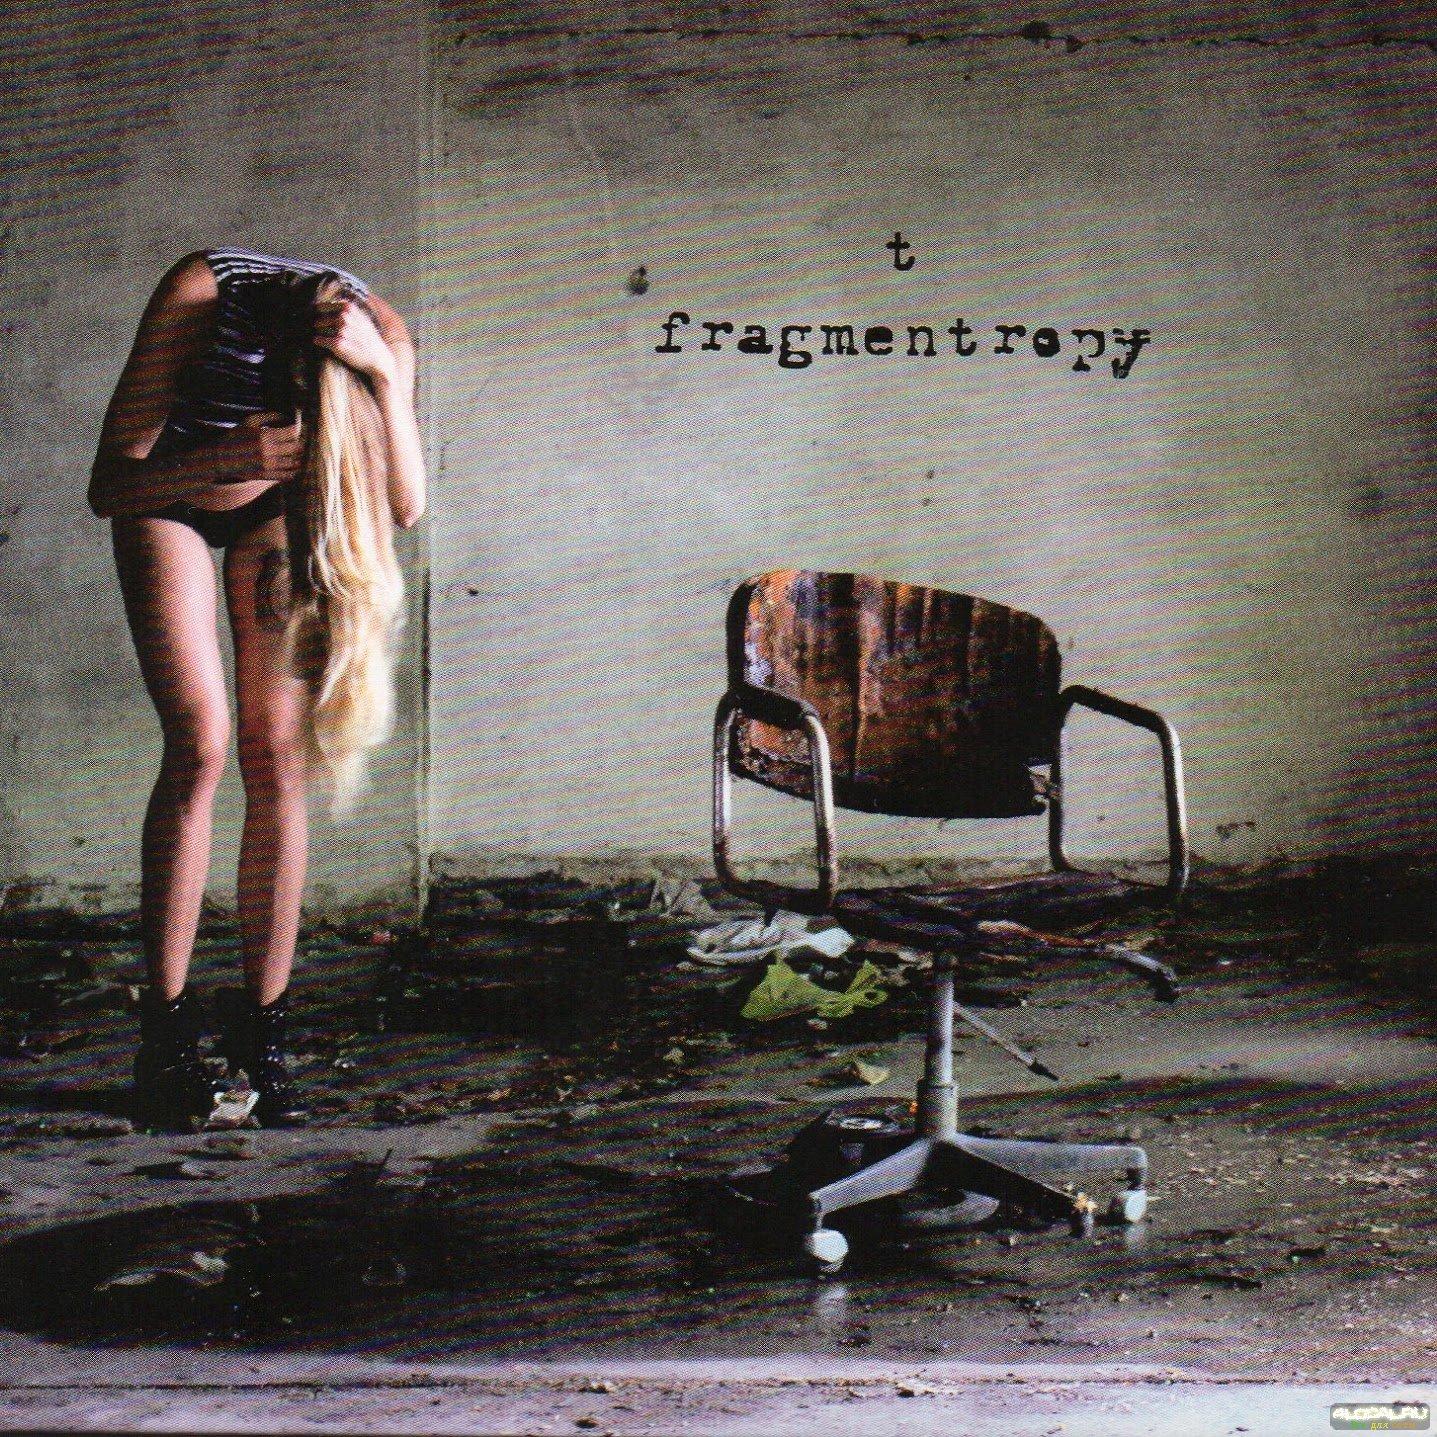 T: Fragmentropy